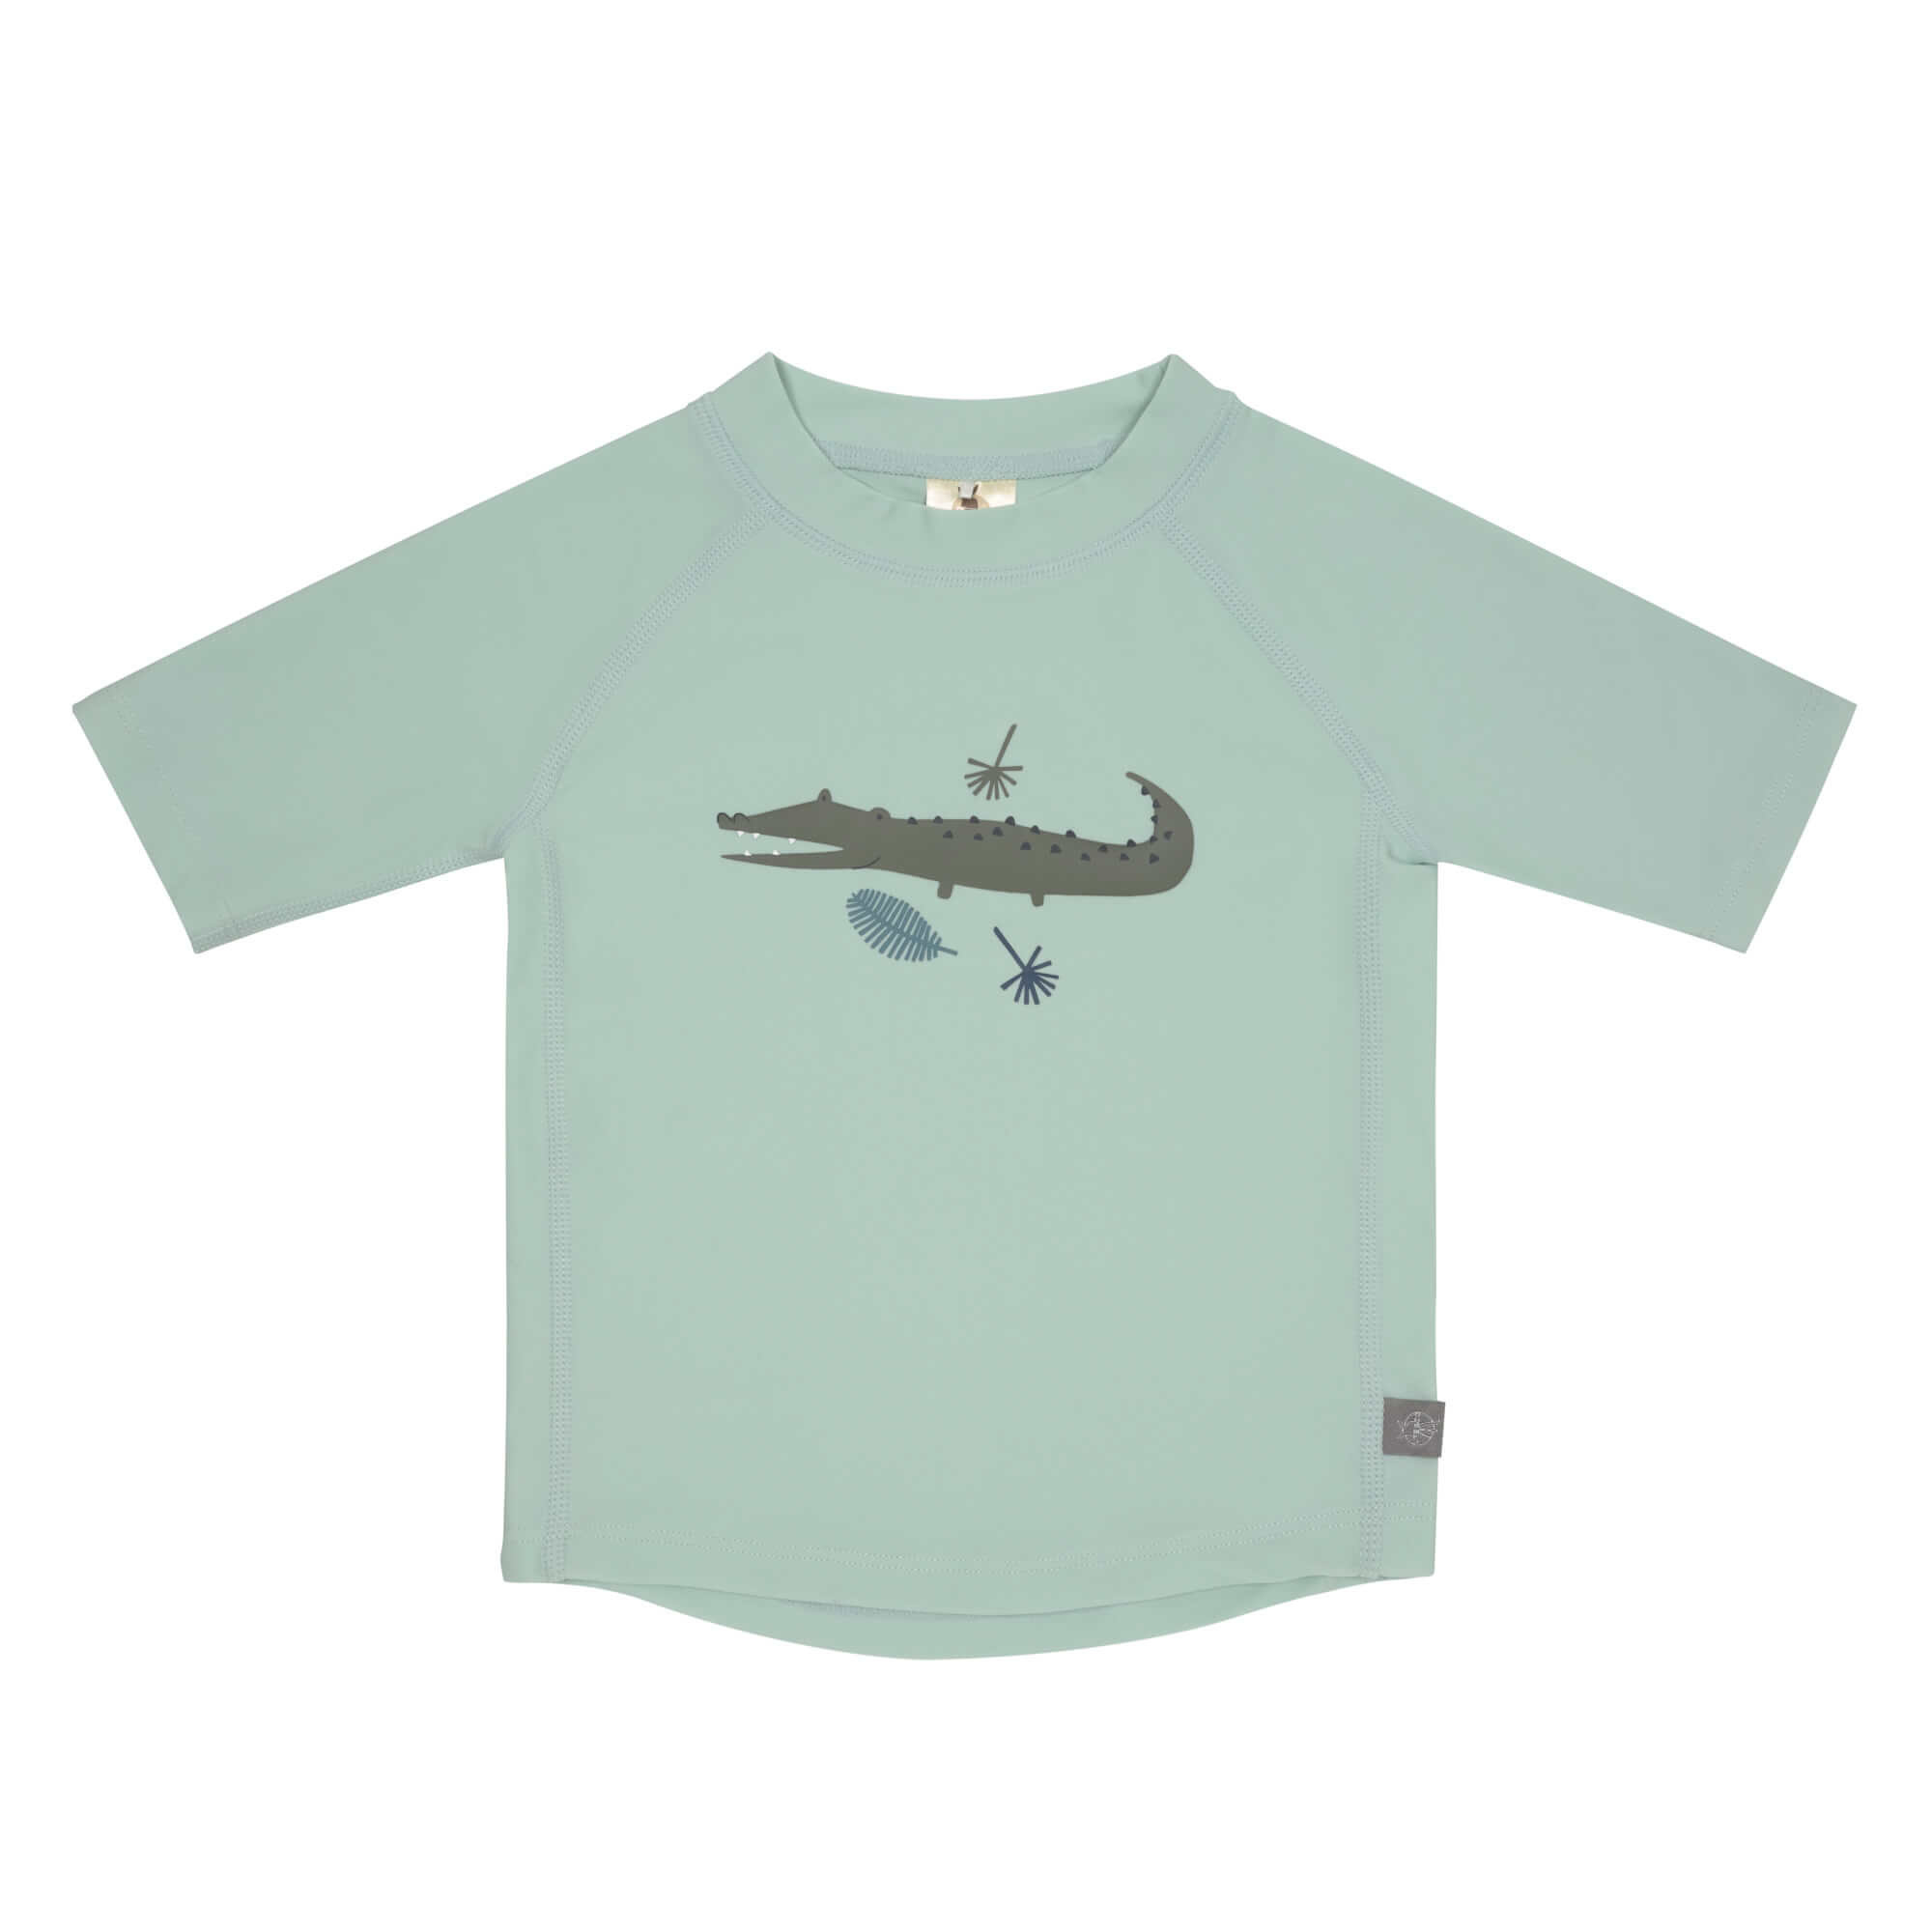 Lässig Splash & Fun Korte mouw Rashguard UV zwemshirt - Crocodile mint